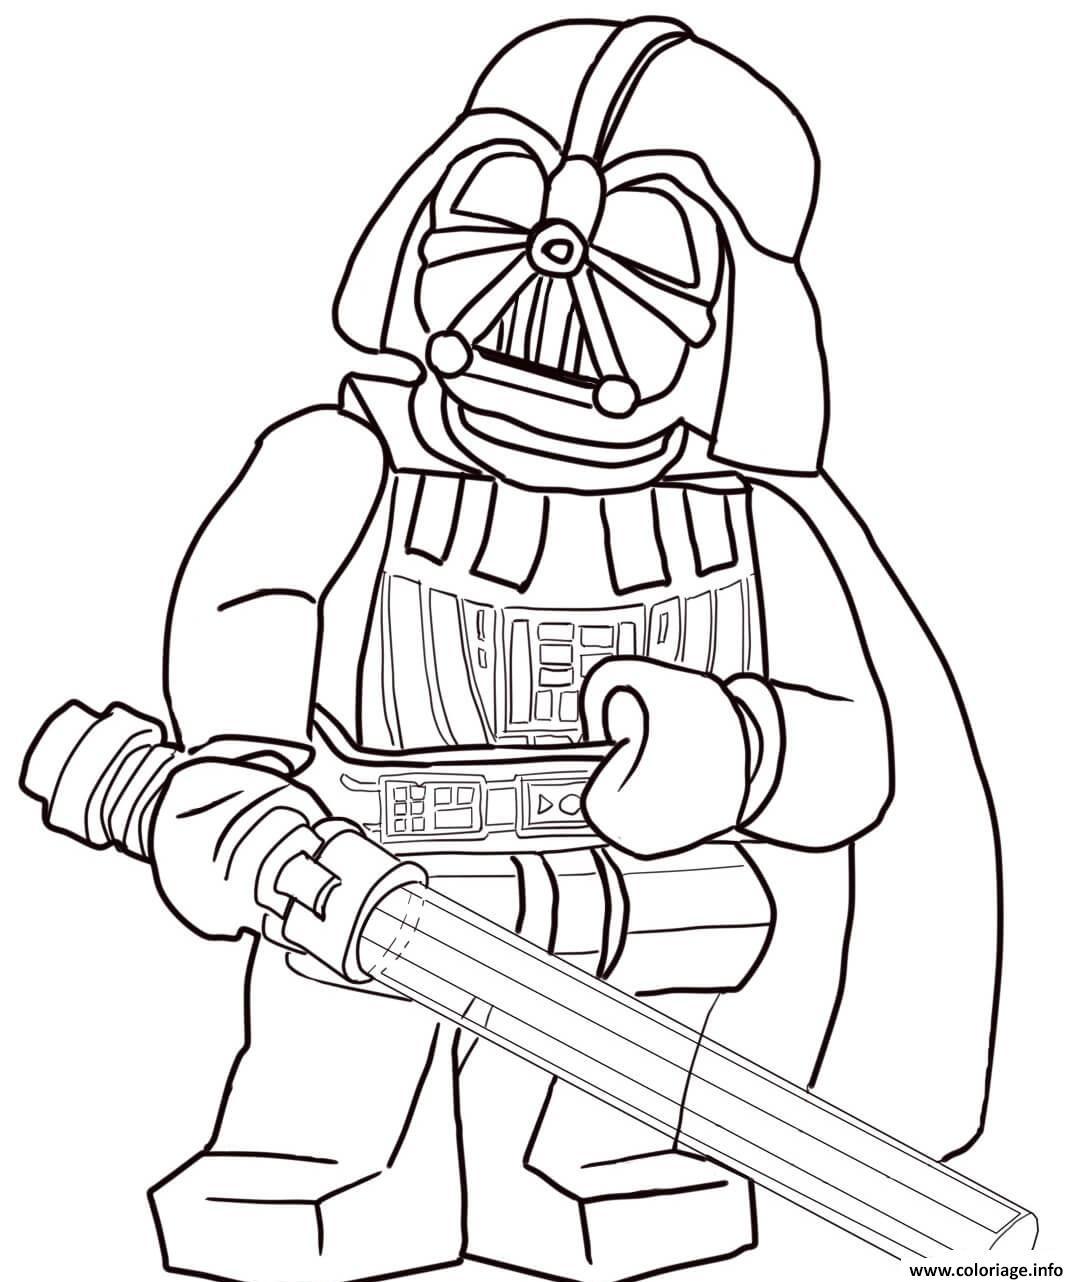 Coloriage lego star wars darth vader dessin - Star wars a imprimer gratuit ...